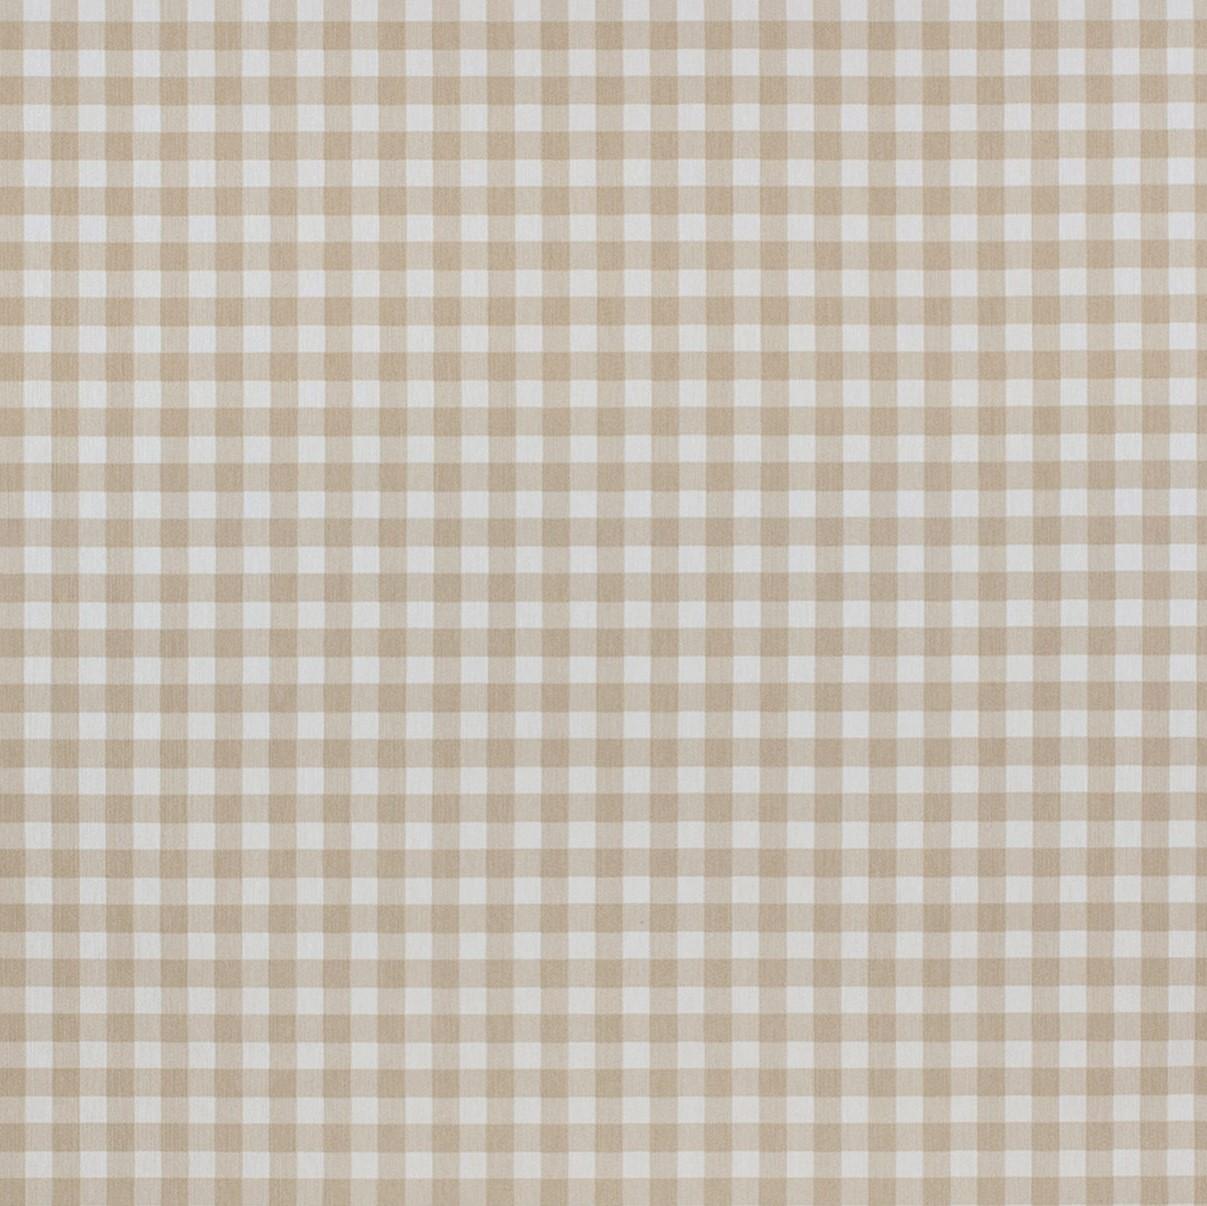 Mantel BISTROTBEIGE Cuadrícula1,3cm Rectangular 1,8x3,2 m [porconfeccionar] [listoen5·7días]